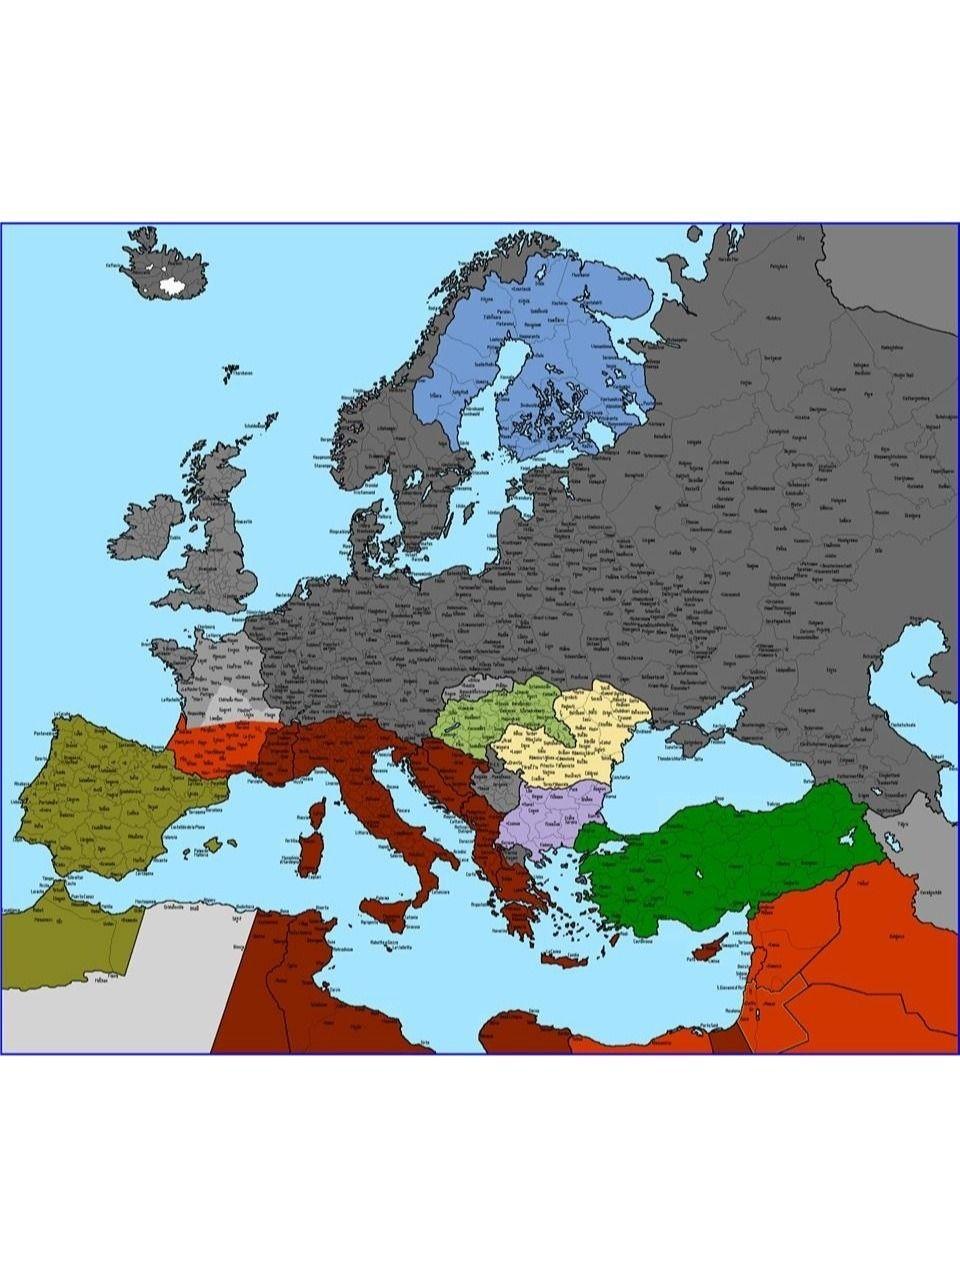 Nazi Map Of Europe.Maps On The Web Europe If Nazi Germany Had Won The War Fantasy